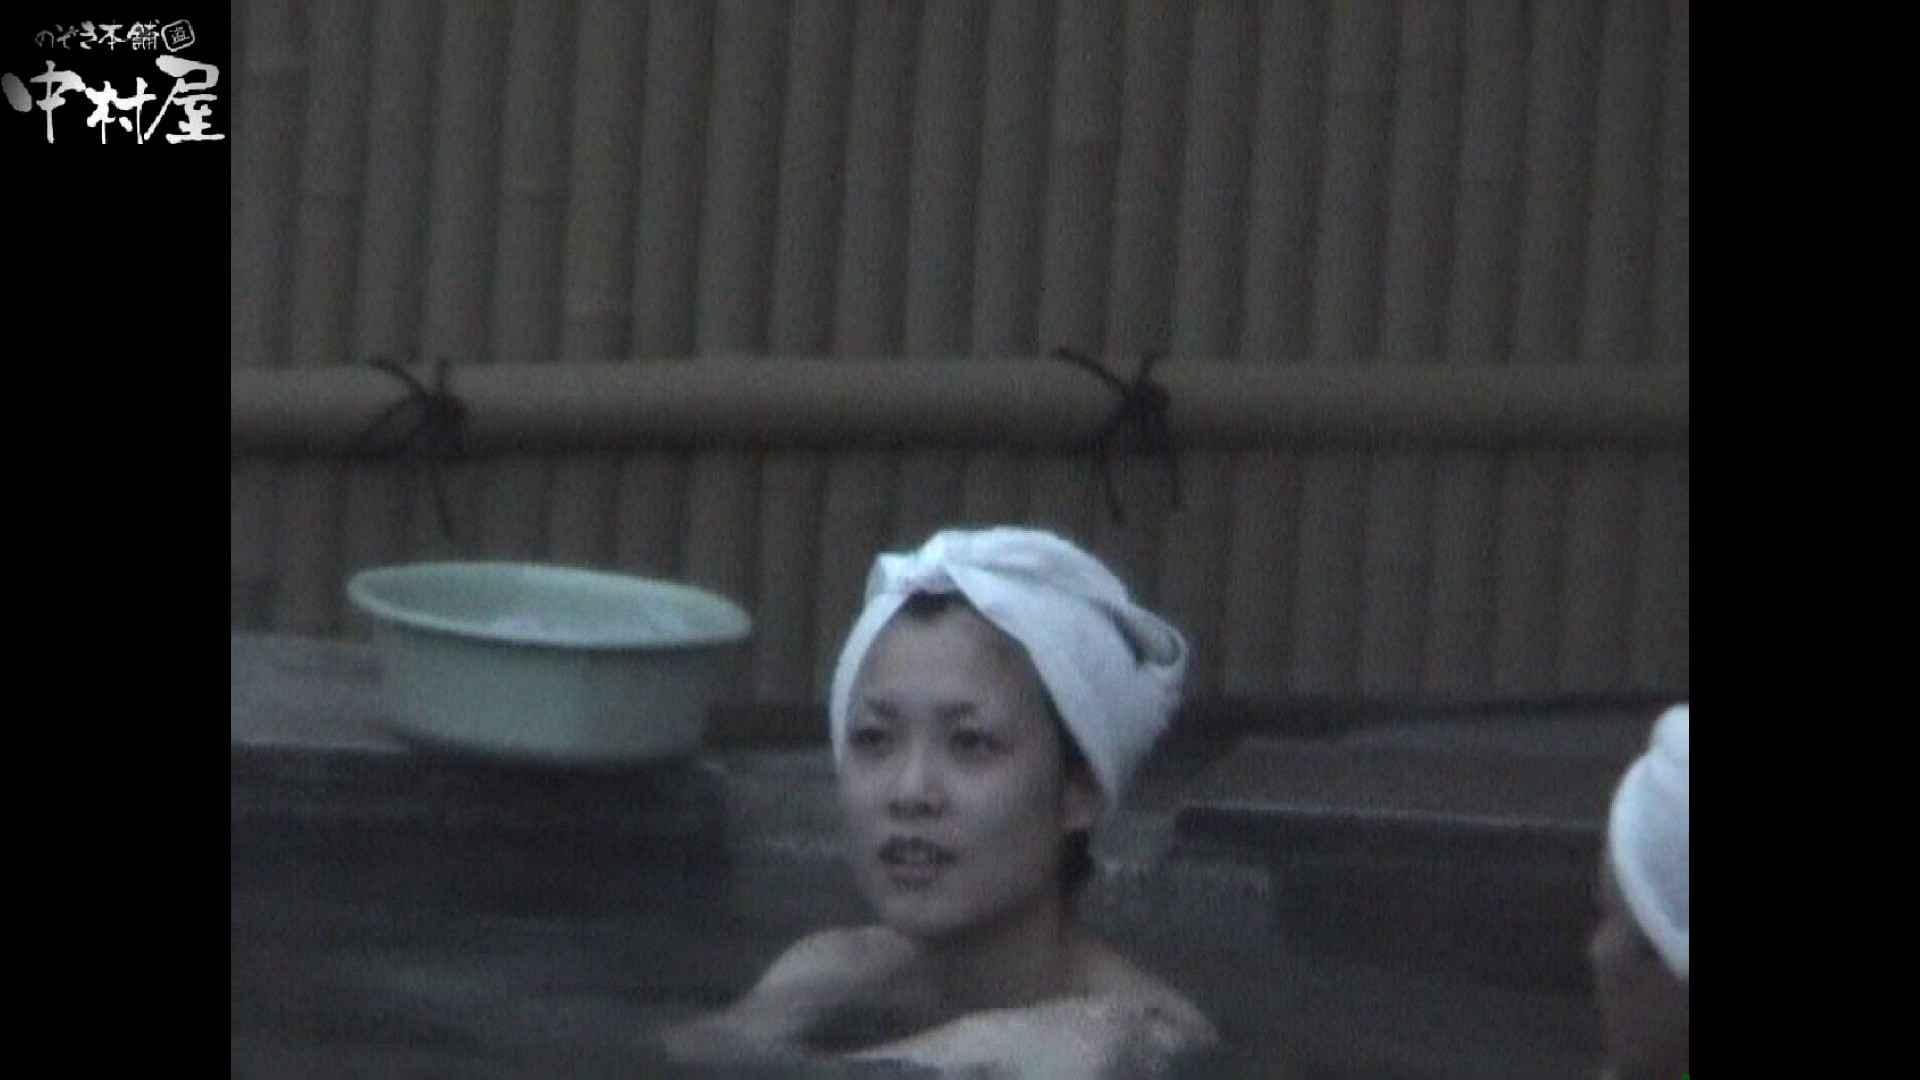 Aquaな露天風呂Vol.924 OLのエロ生活 オメコ動画キャプチャ 62連発 17